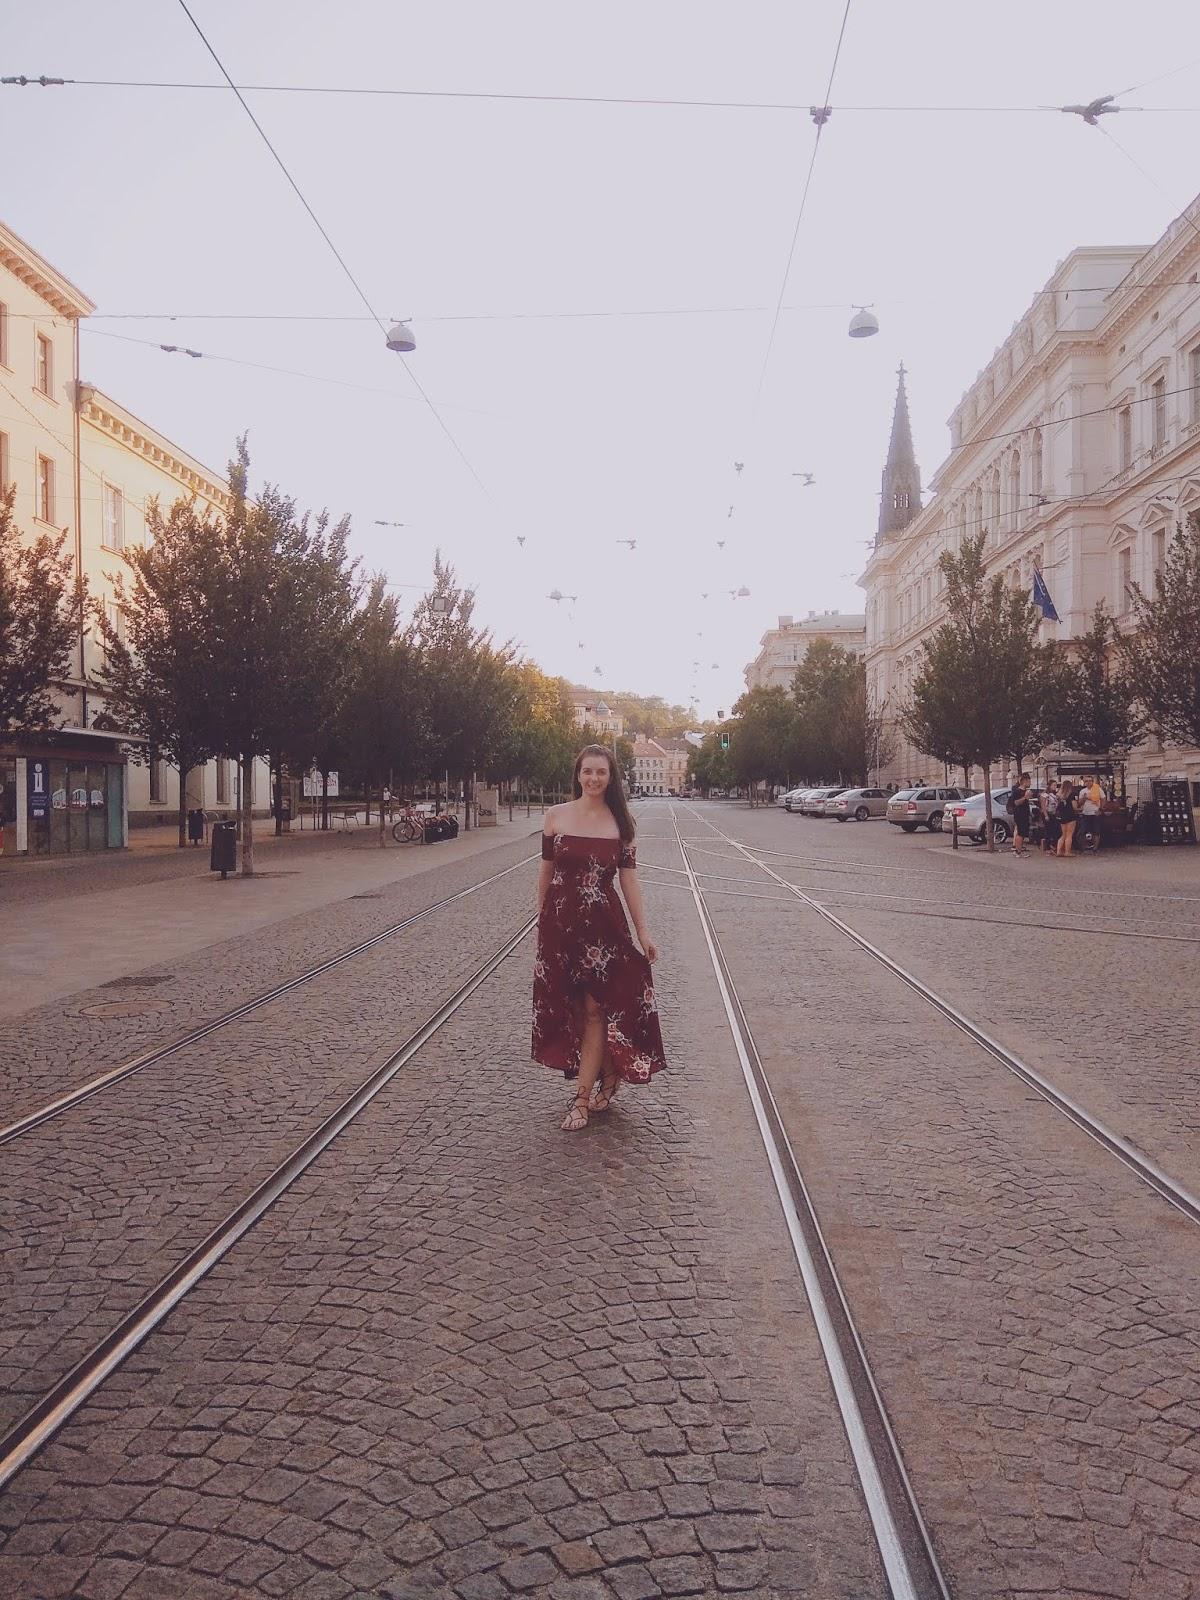 https://sanjaburgundy.blogspot.com/2018/07/busy-street.html